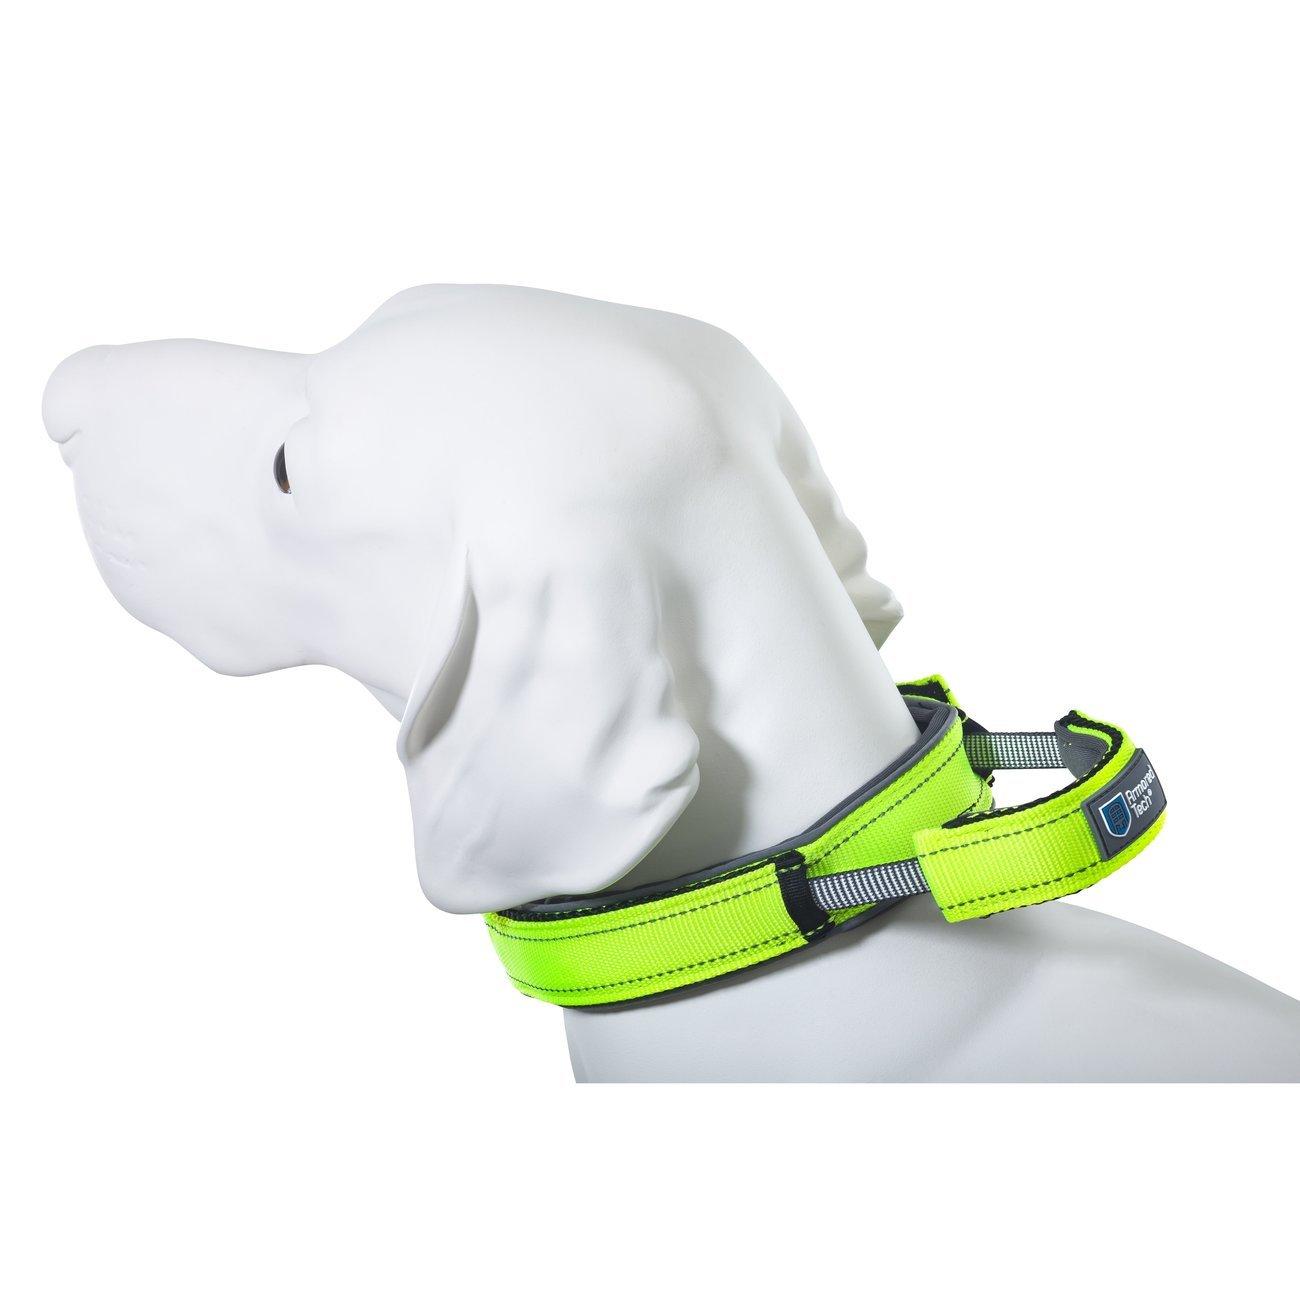 Armored Tech ArmoredTech Hundehalsband, Bild 8